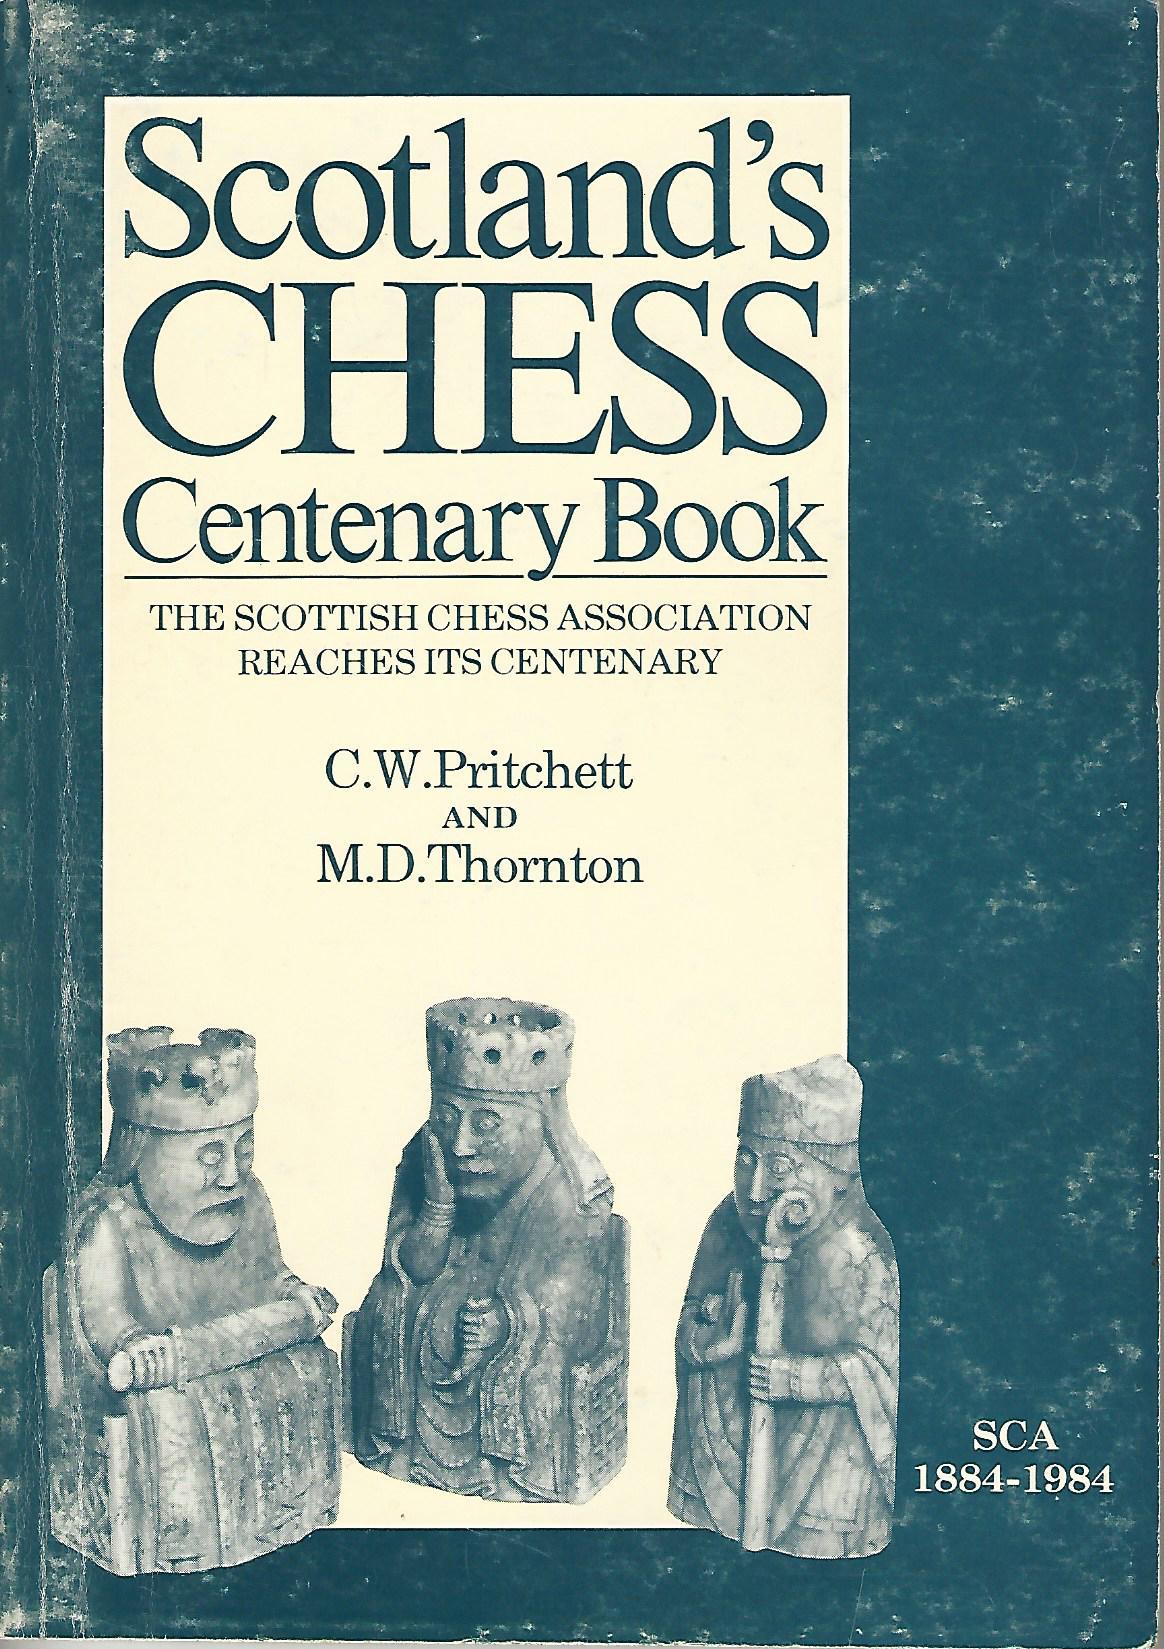 Scotland's Chess Centenary Book.